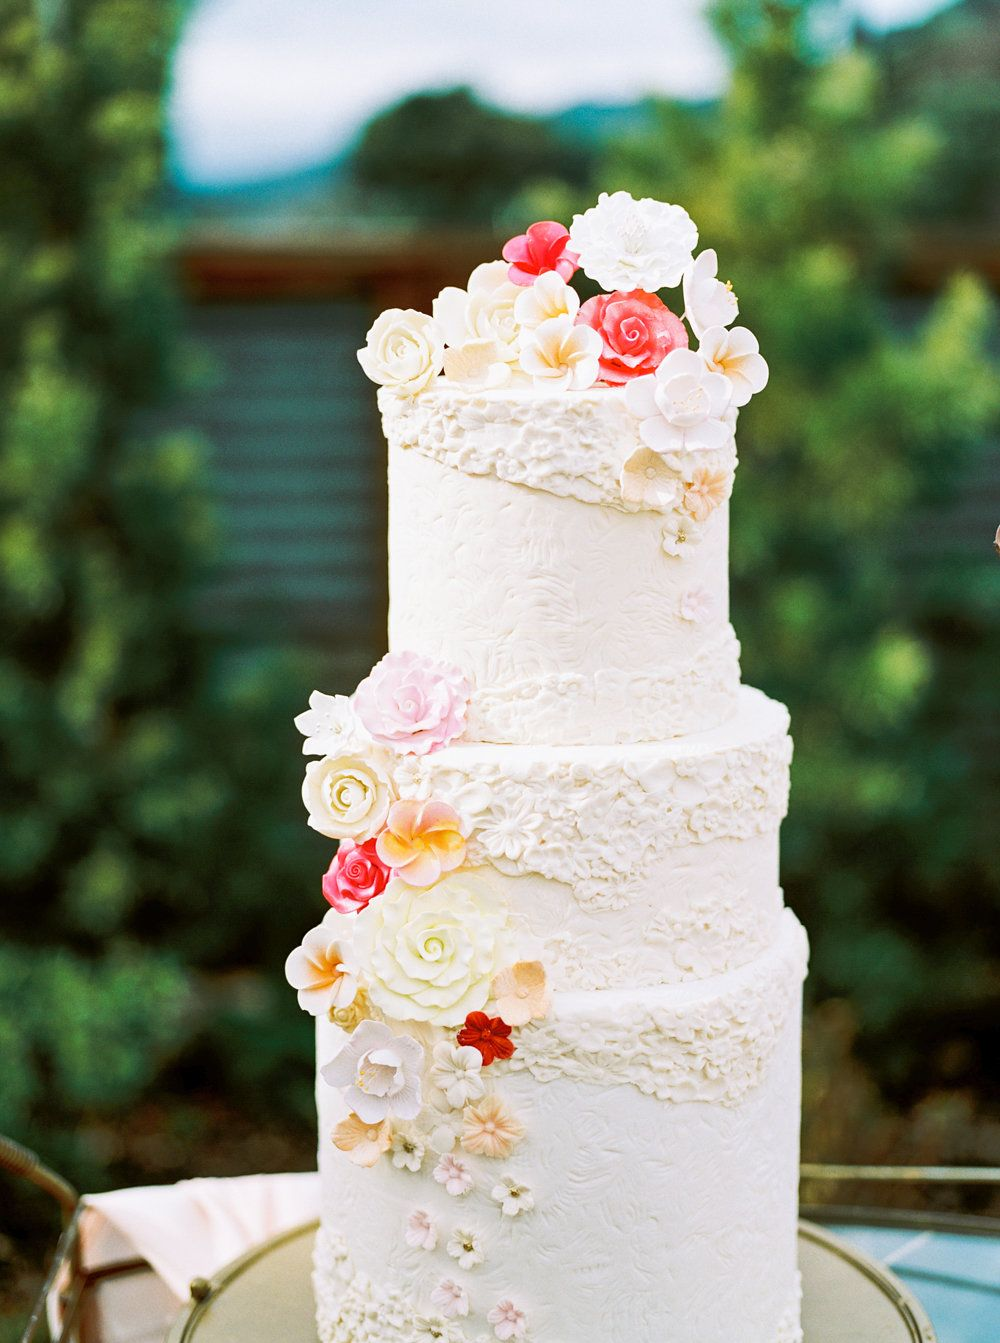 Spring floral wedding cake c a k e s g a l o r e in